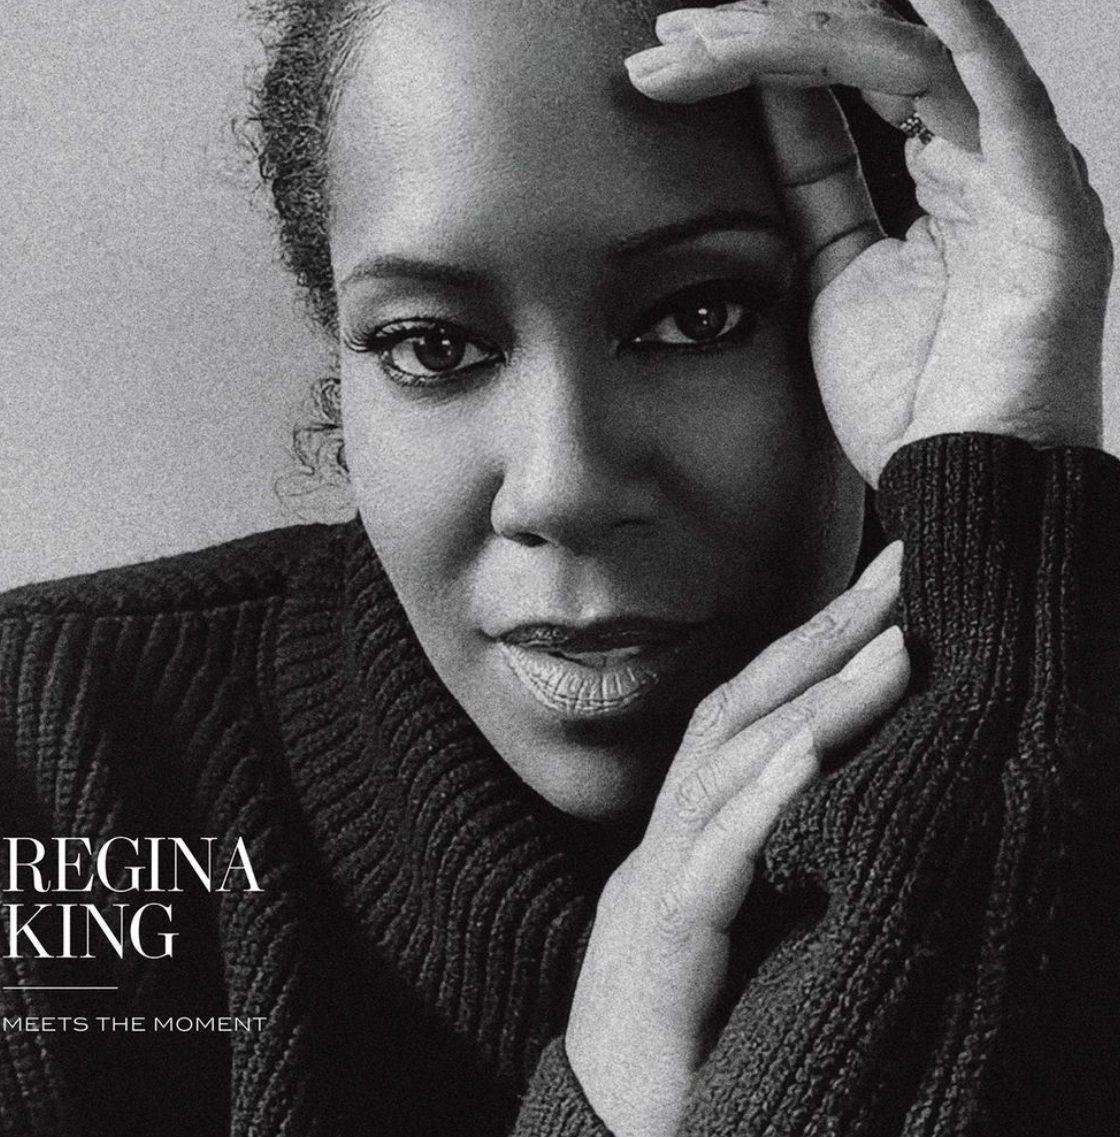 regina-king-wsj-magazine-cover-december-january-2020-style-rave